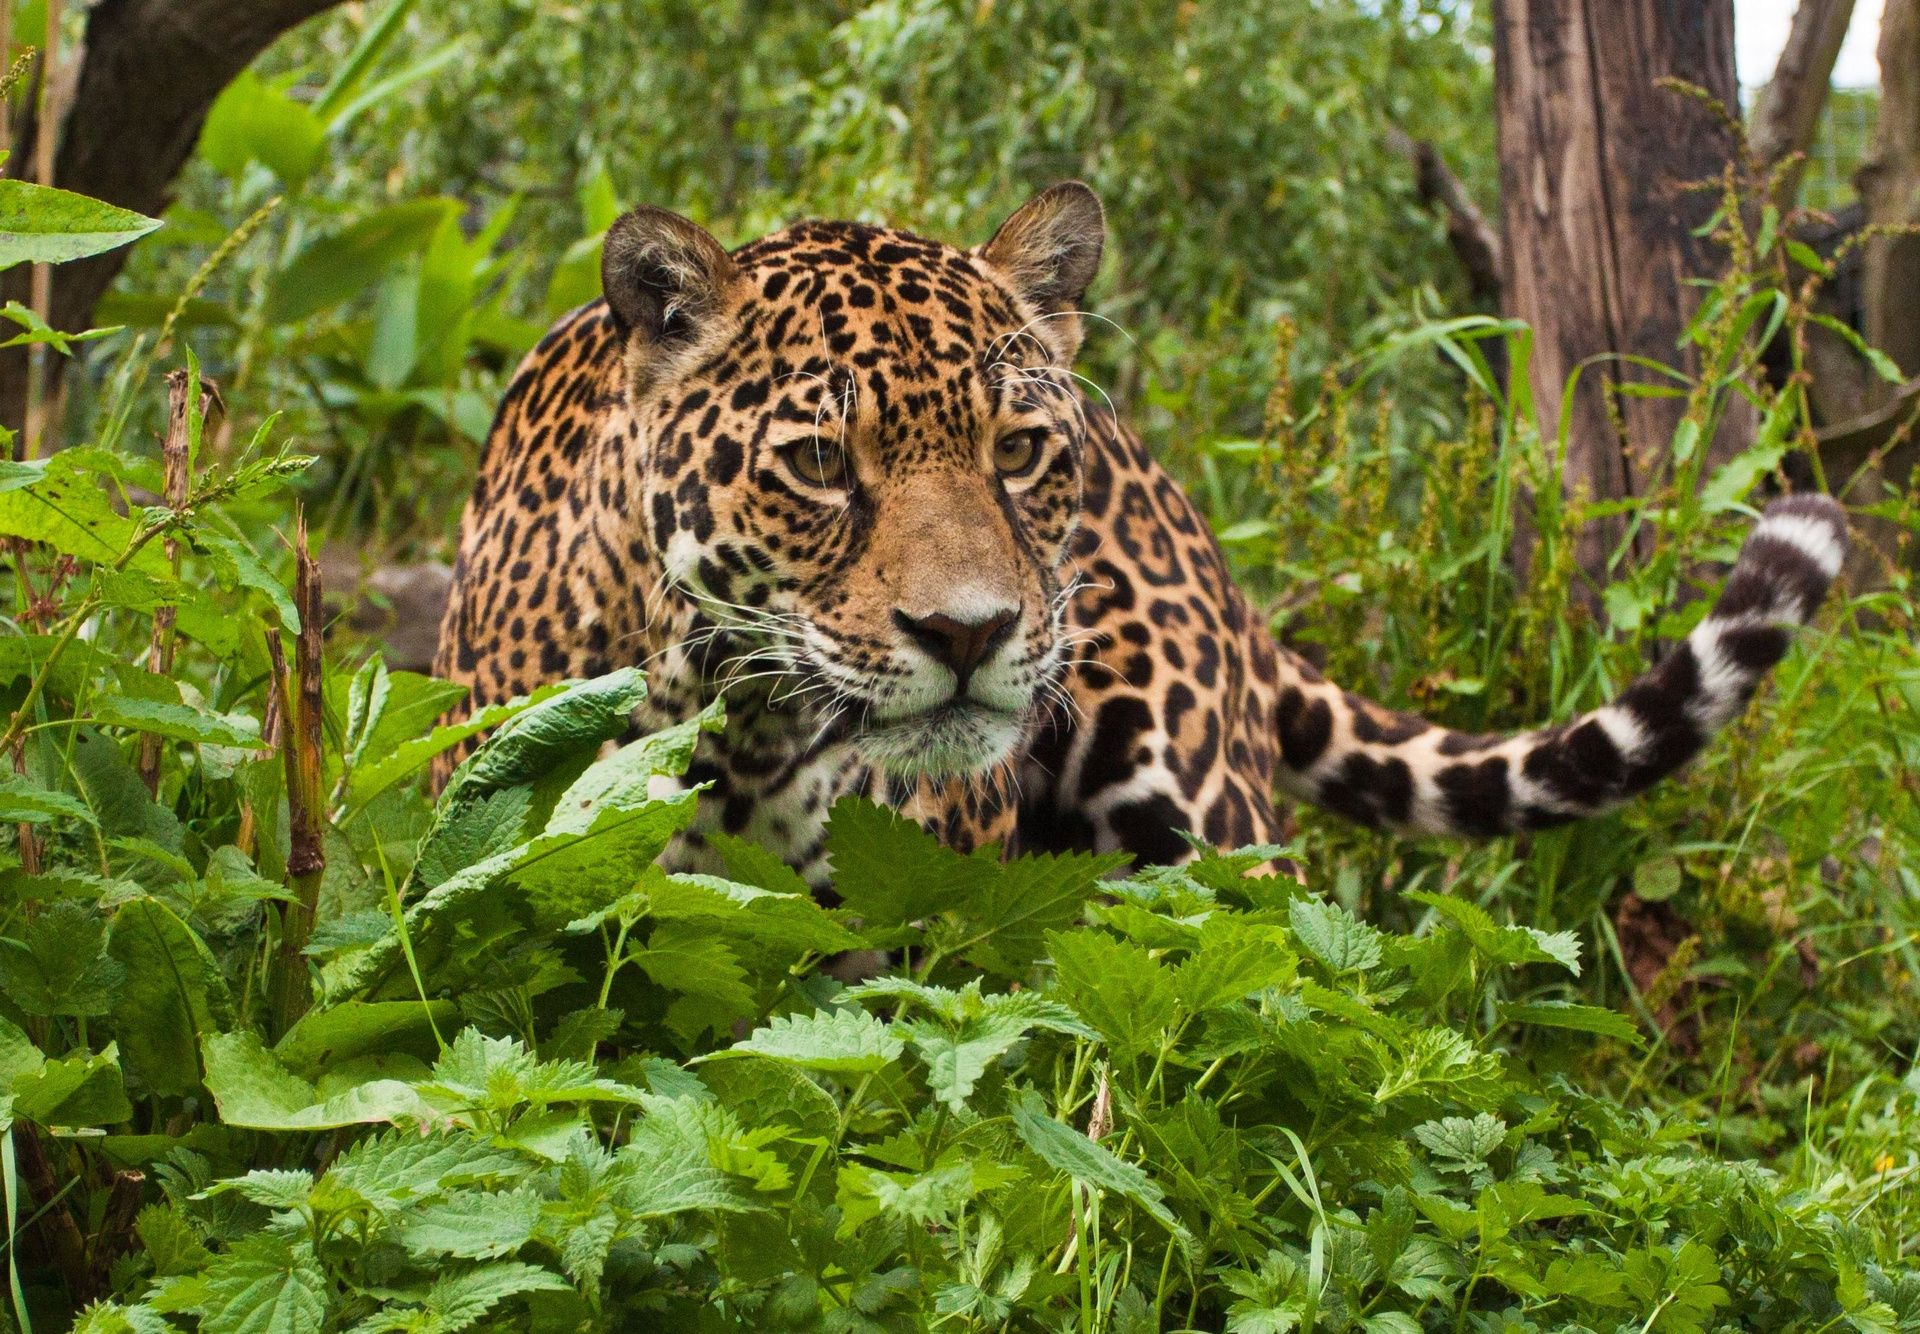 home jaguar cat hd wallpaper tropical rainforest animals | ЗАБАВНЫЕ